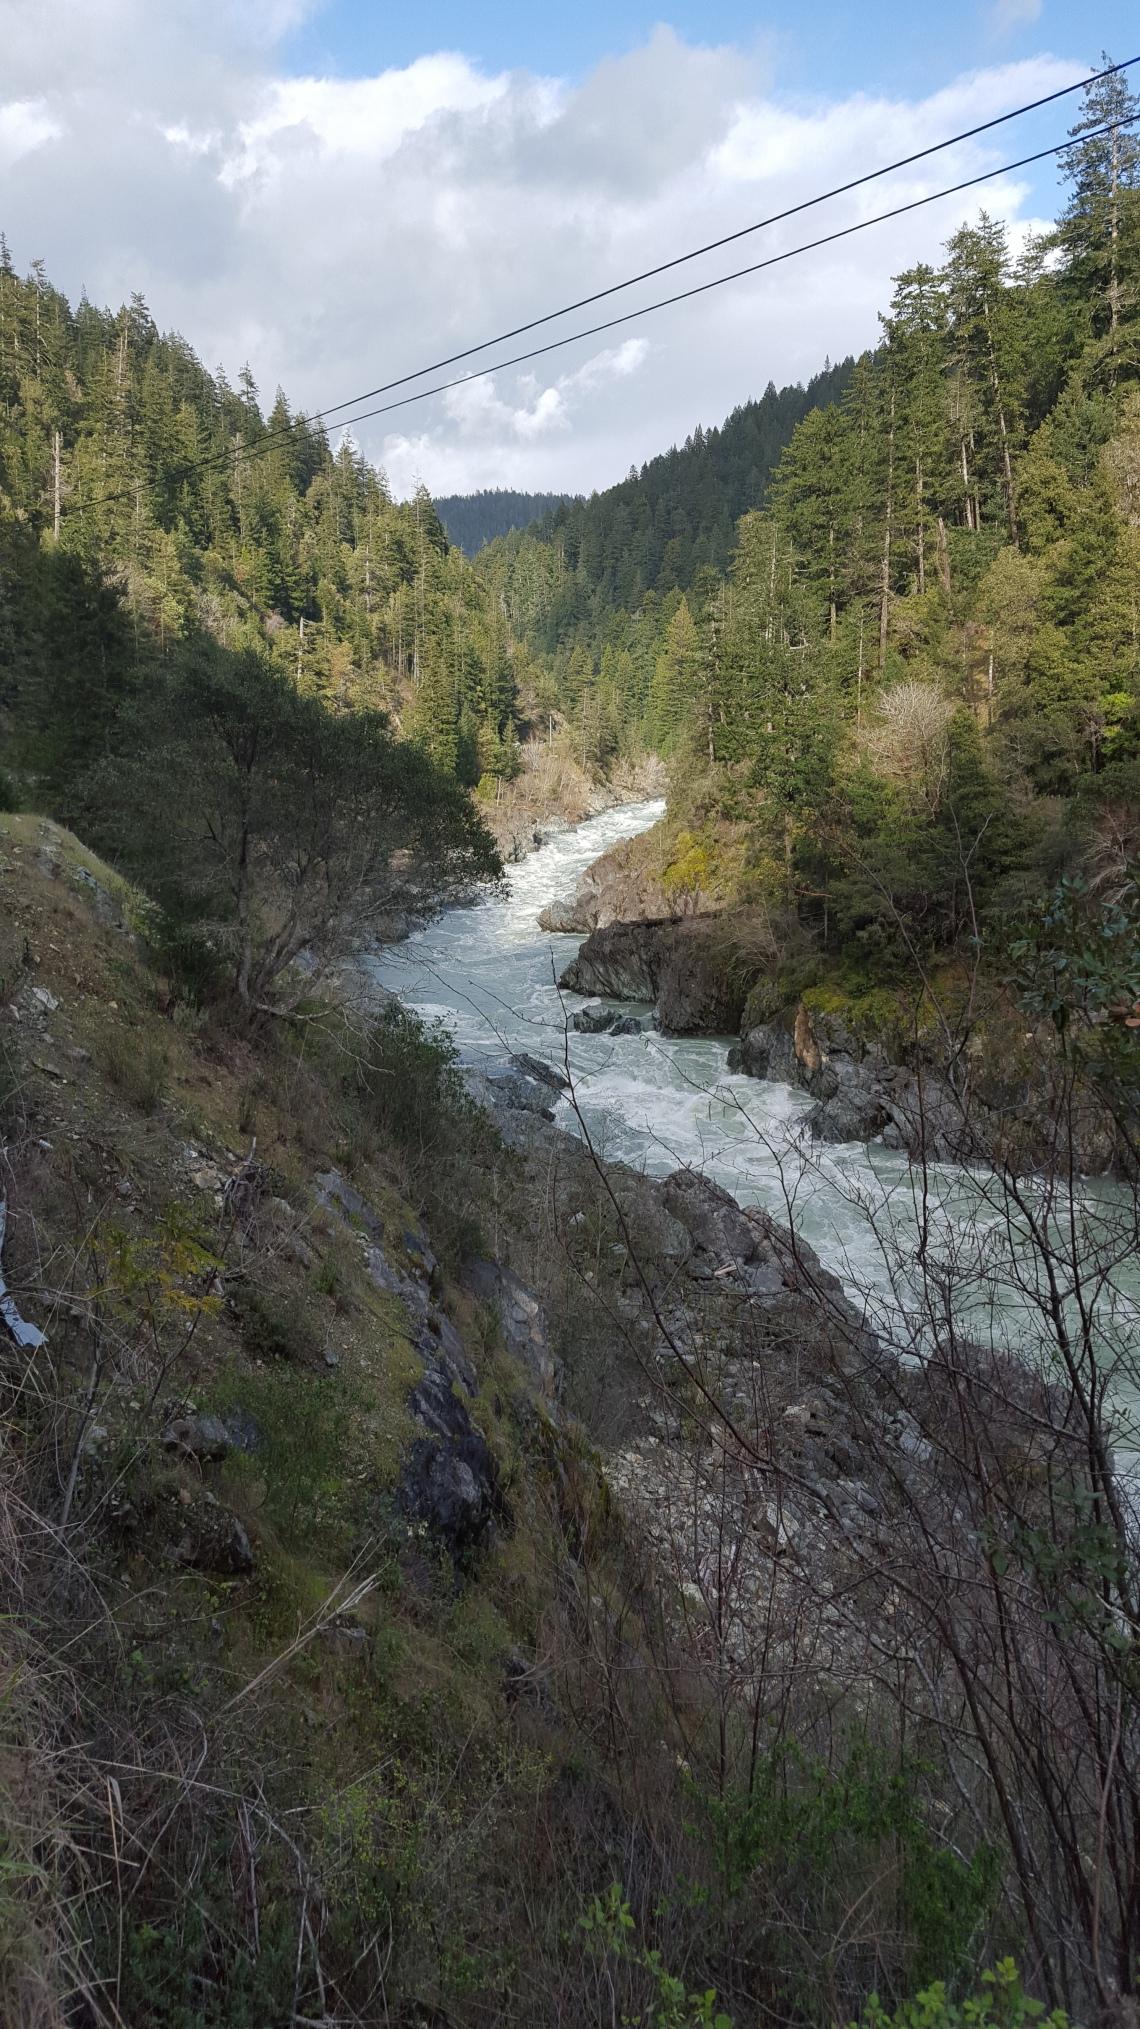 Highway 199 California-Oregon 14.03.162016-03-14 17.08.26